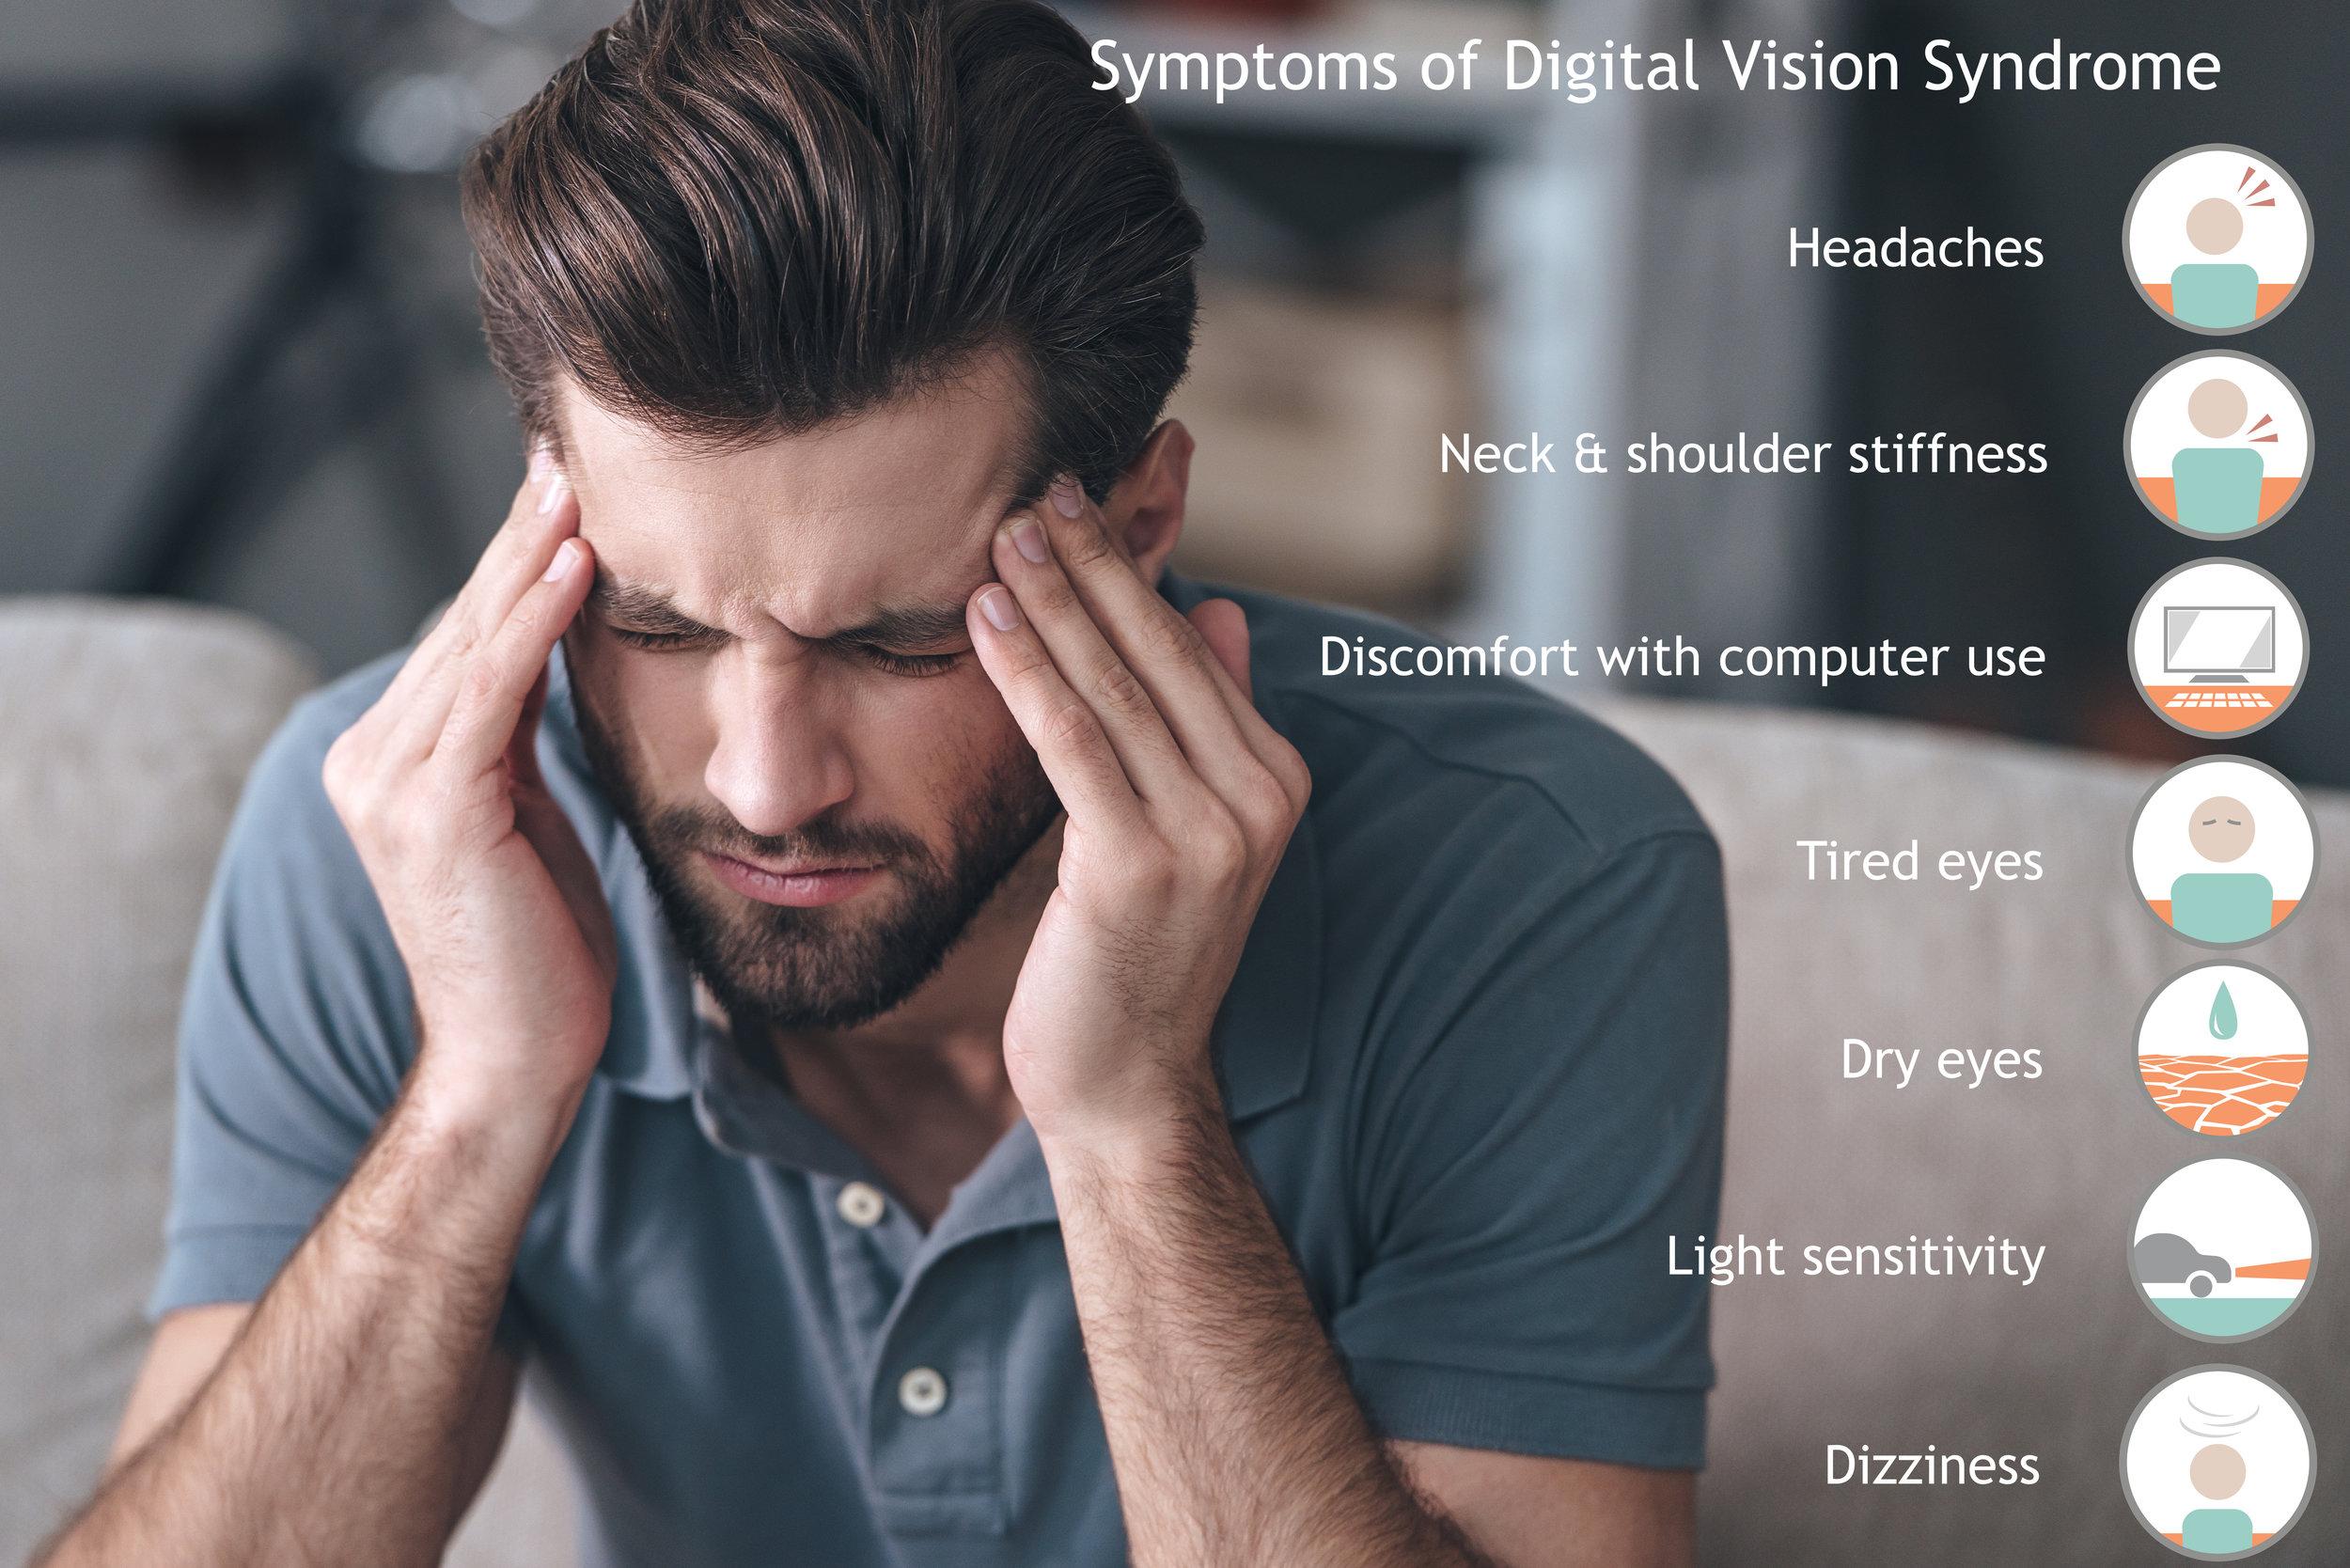 Symptoms of digital syndrome graphic.jpeg